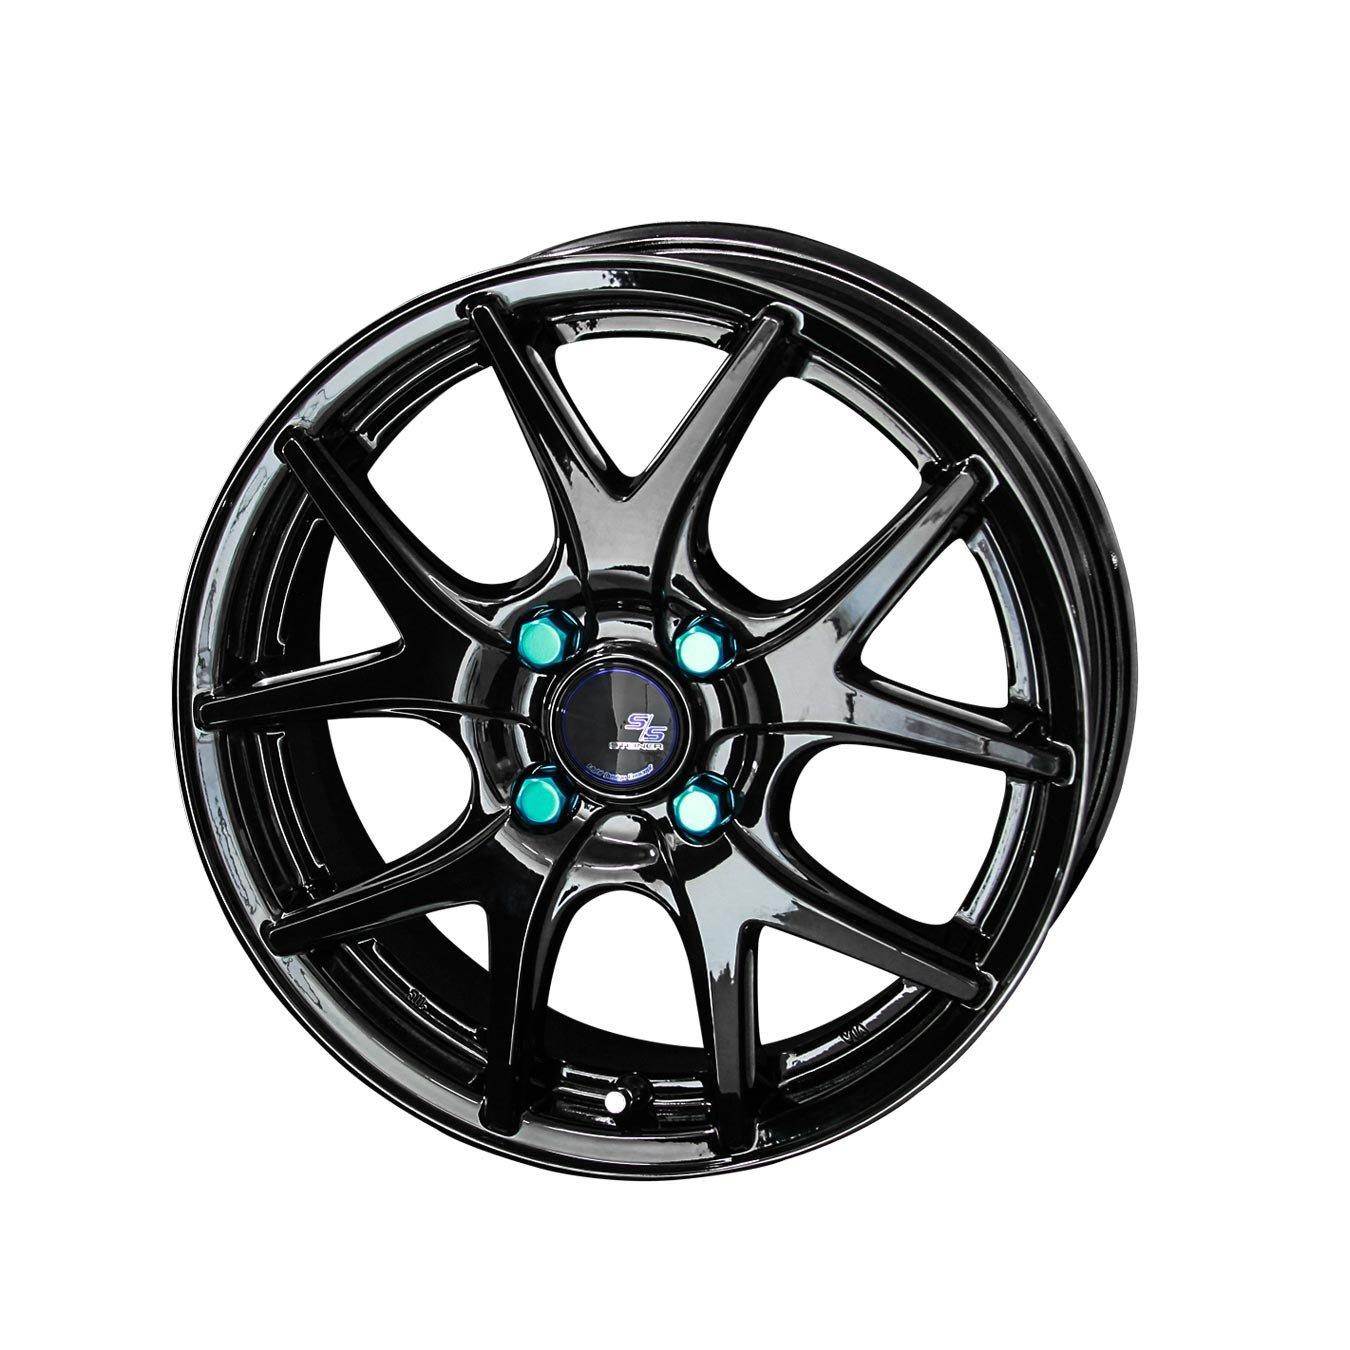 KYOHO【共豊】タイヤホイール 2本セット 15インチ STEINER SL5 15X5.5 +43 4H100 カラー グロスブラックサイドカット B01DVN68TE